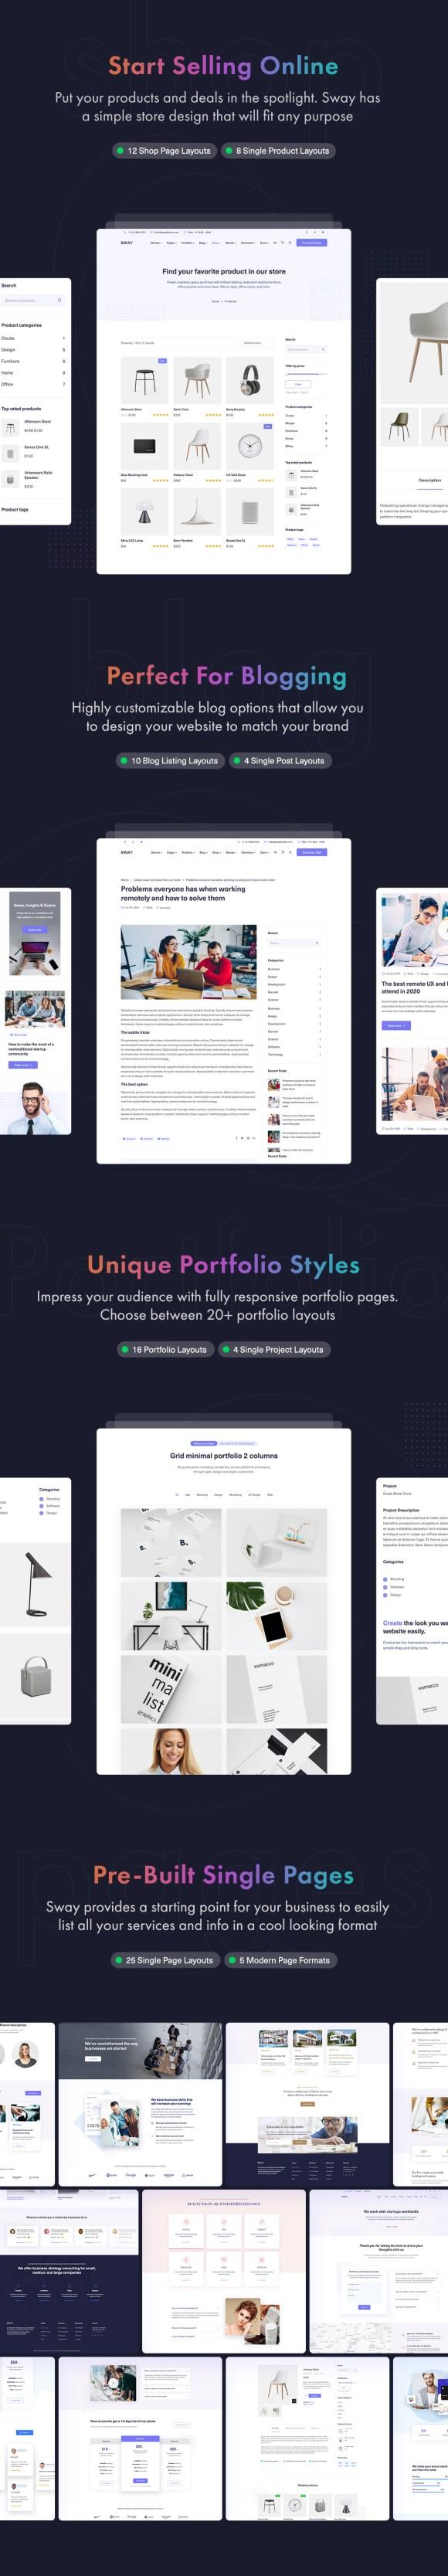 Sway - Multi-Purpose WordPress Theme with Page Builder - 16